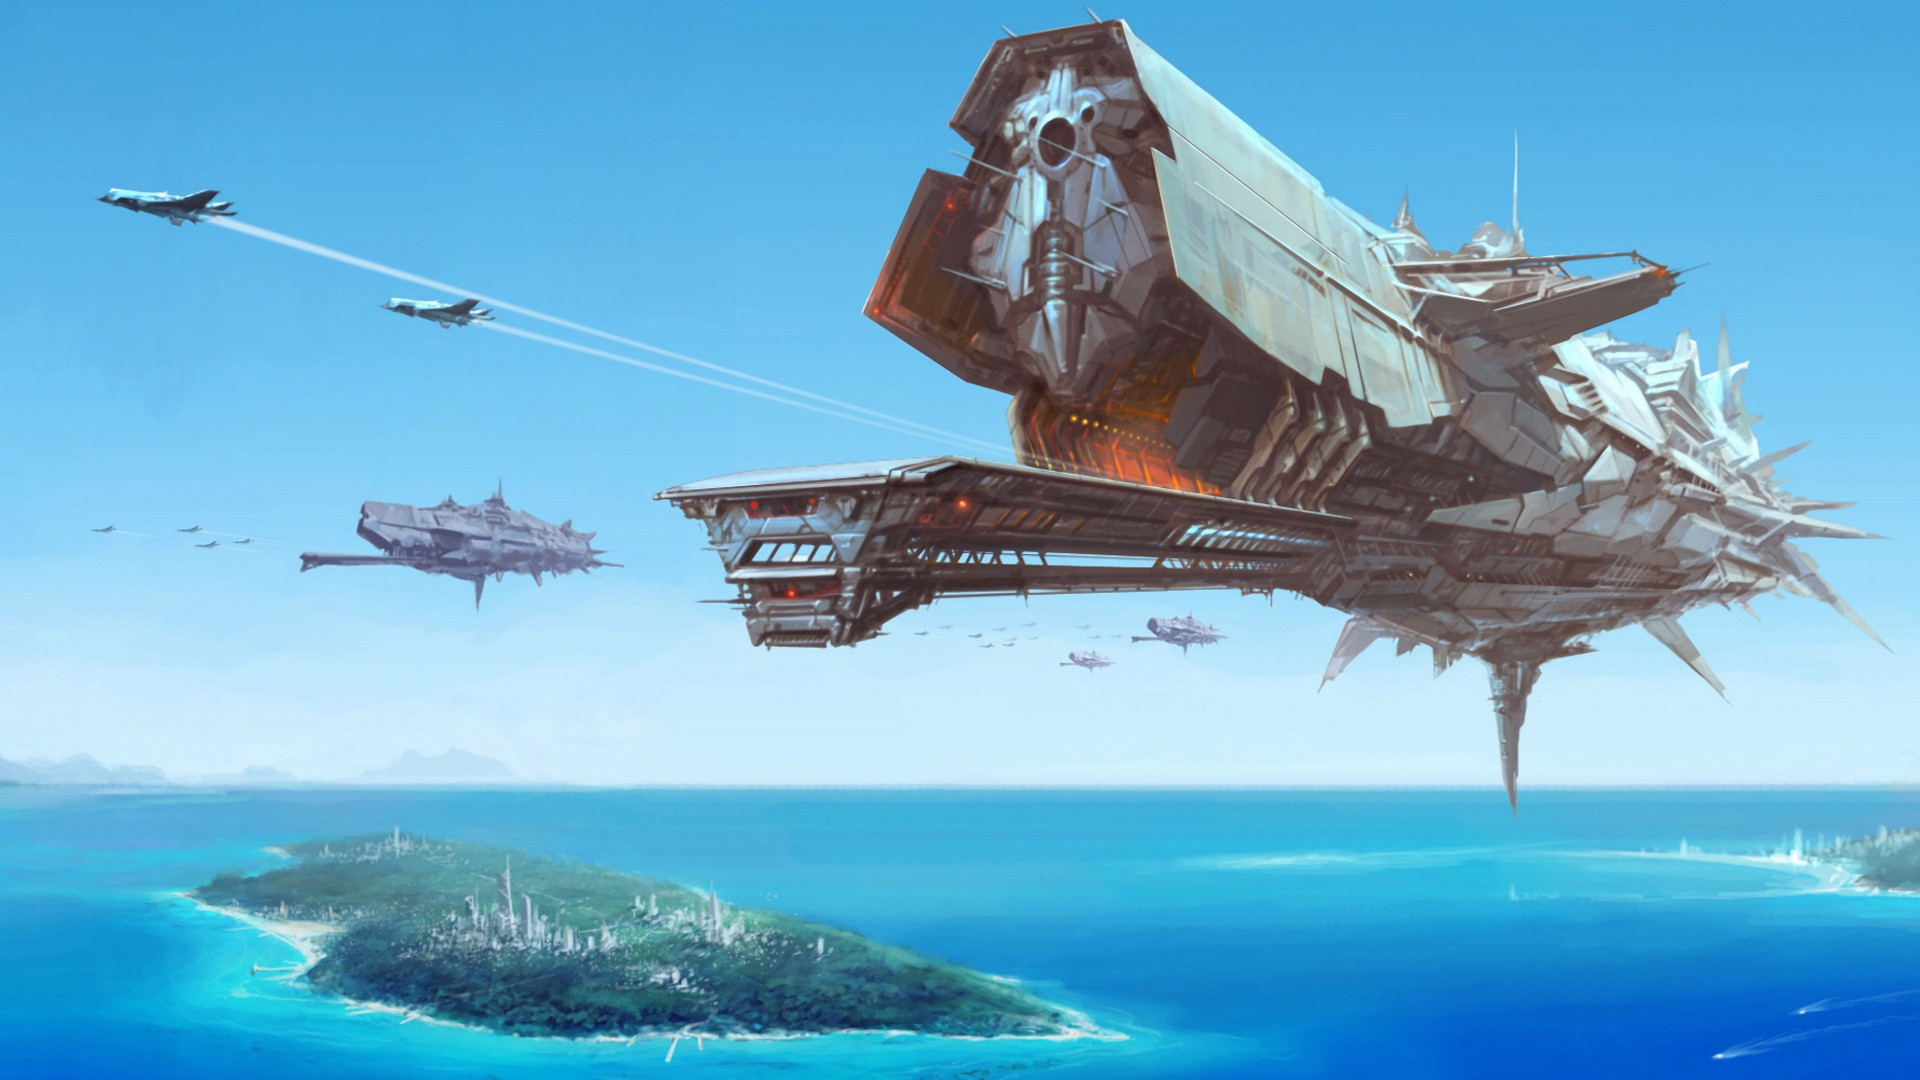 General 1920x1080 spaceship futuristic aircraft fantasy art island contrails sea science fiction artwork airplane digital art